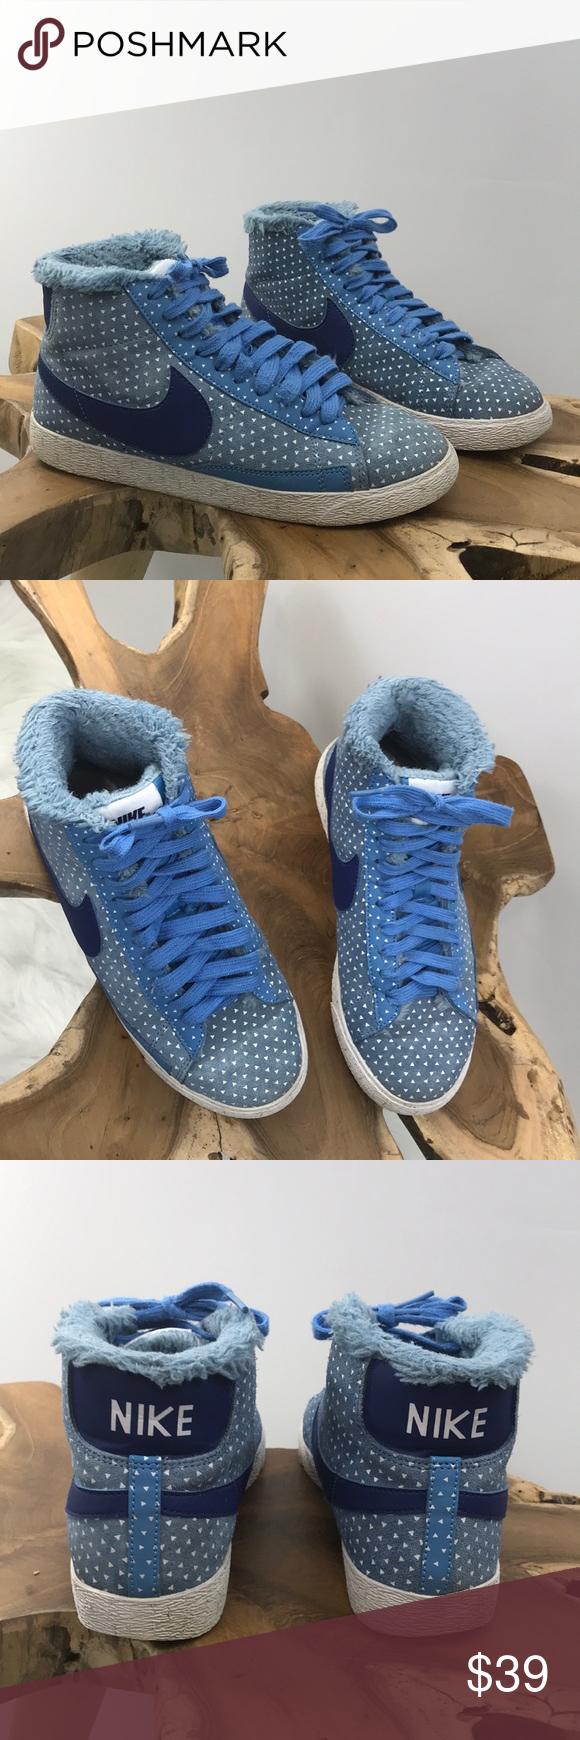 2b830bebfda Nike Blazer Mid Print Blue Navy high top Sneaker